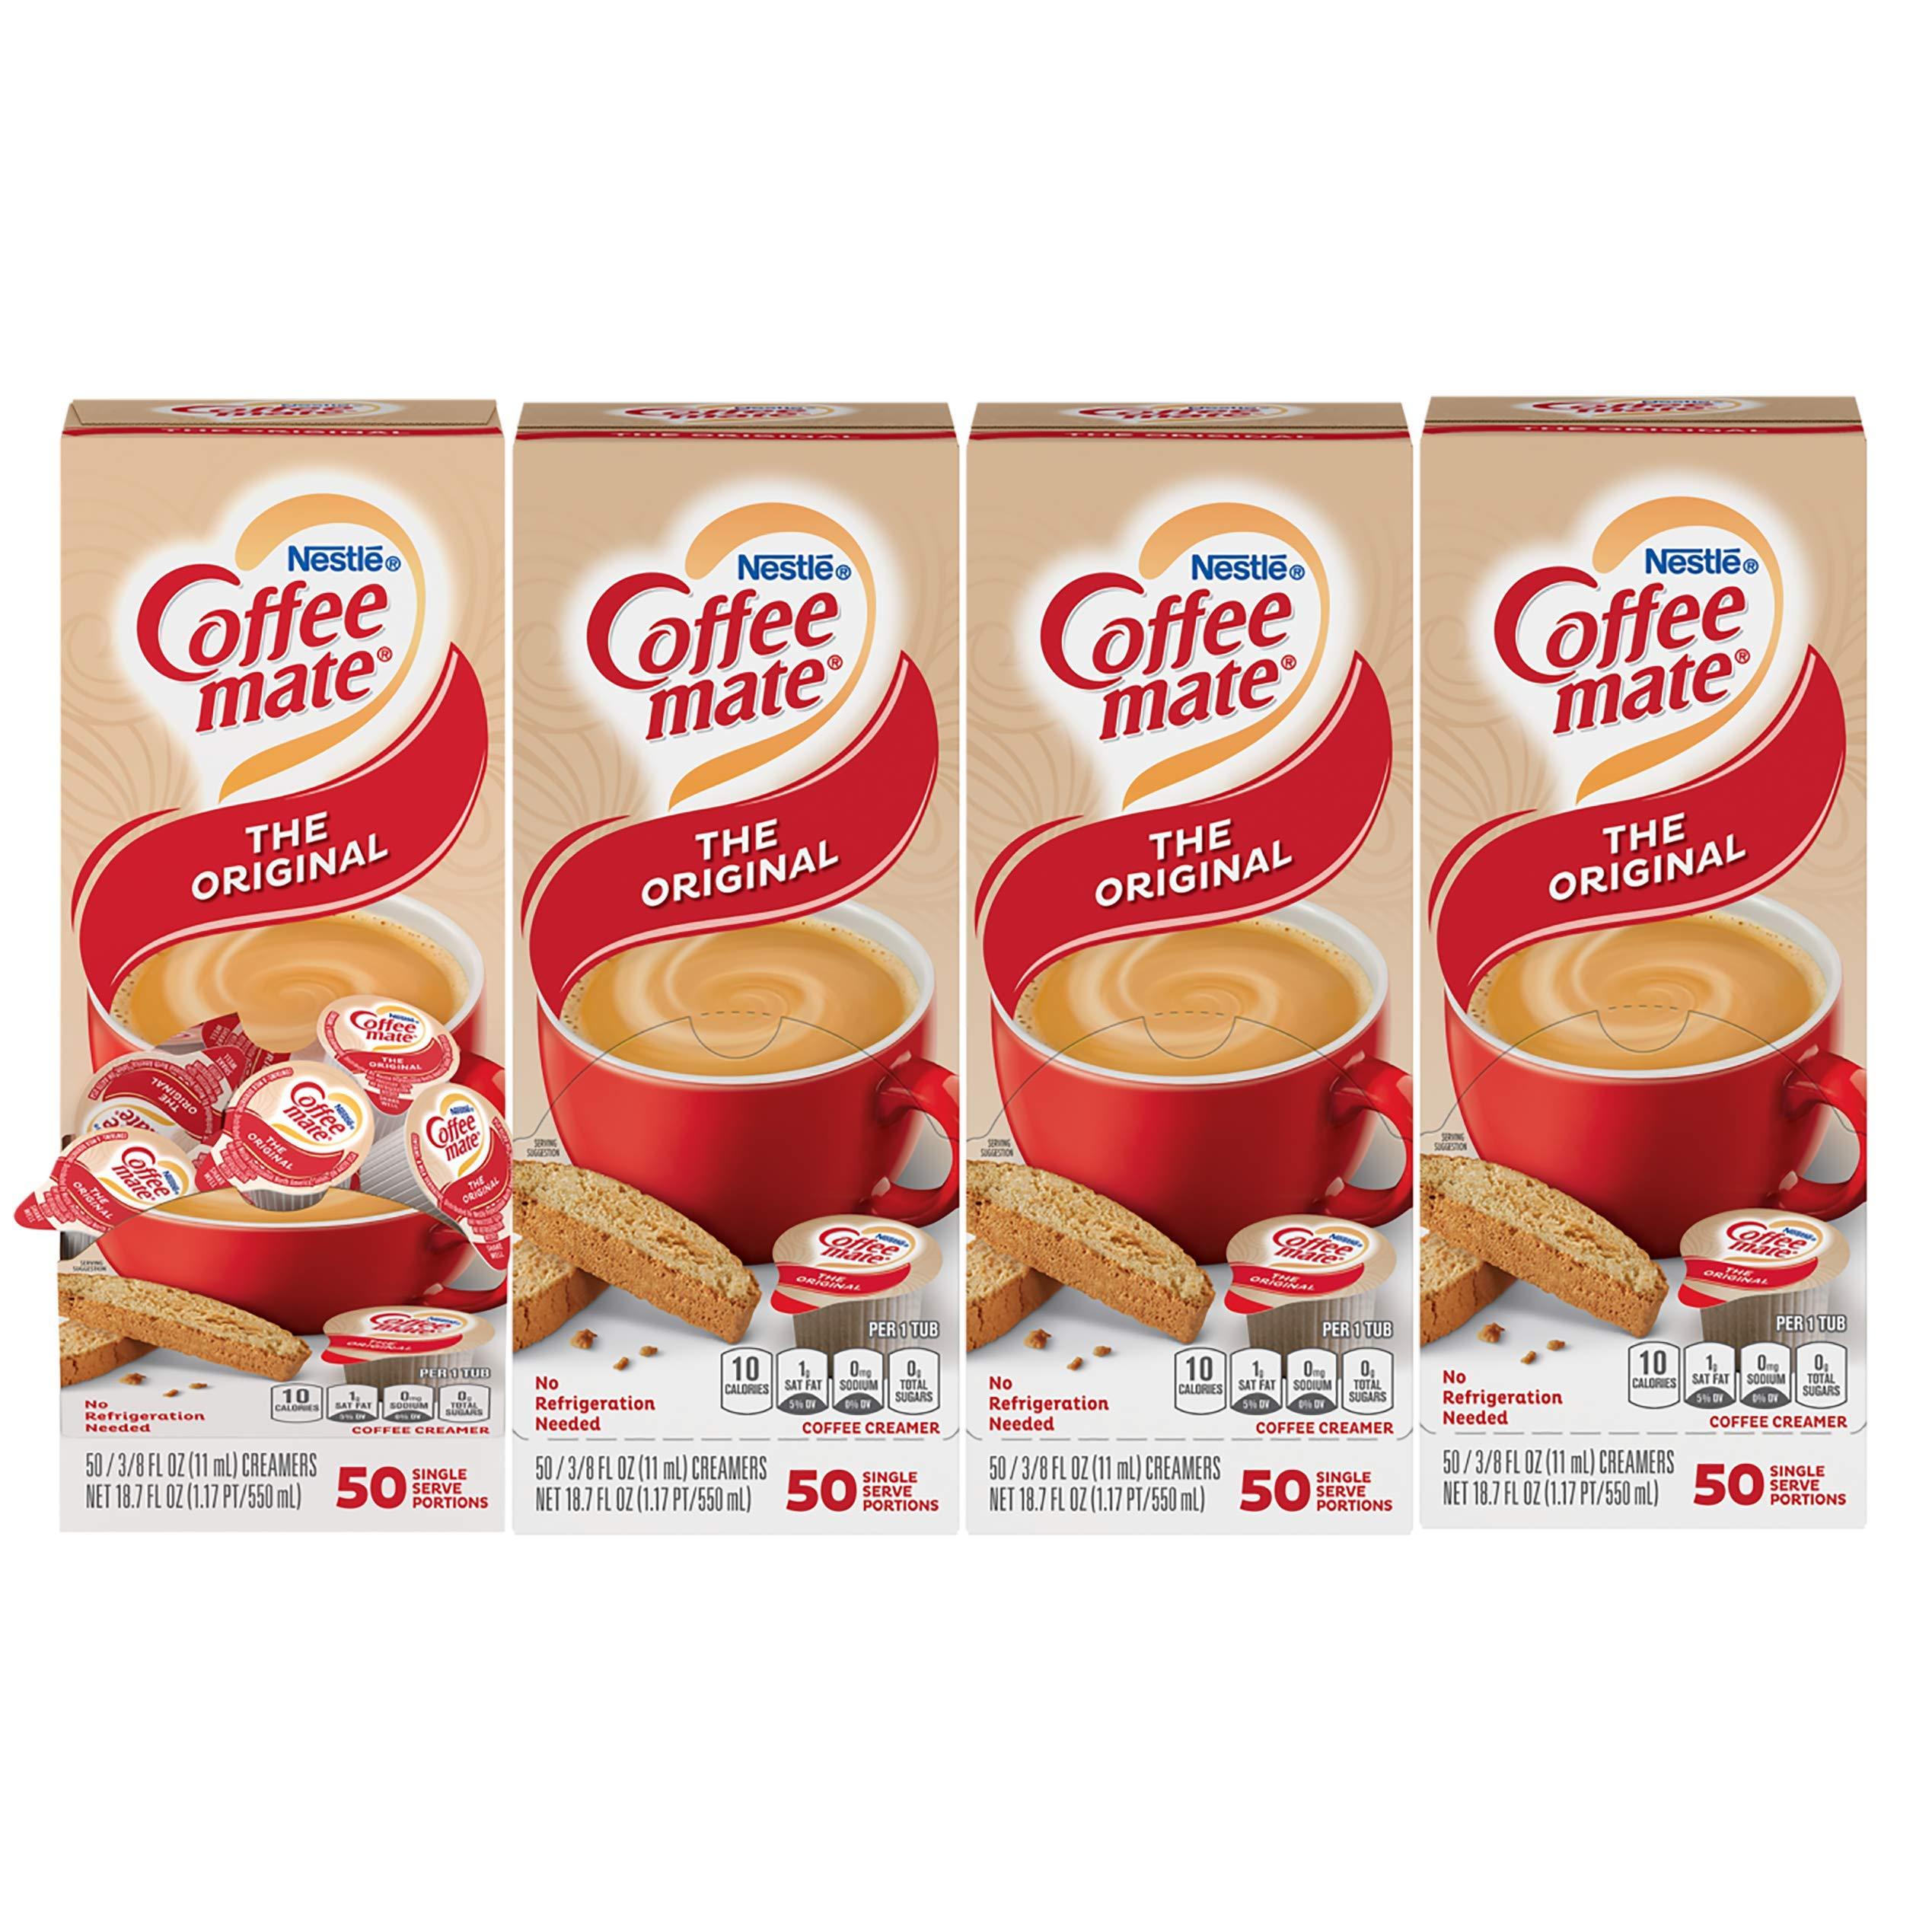 Nestle Coffee mate Coffee Creamer, Original, Liquid Creamer Singles, Non Dairy, No Refrigeration, Box of 50 Singles (Pack of 4)